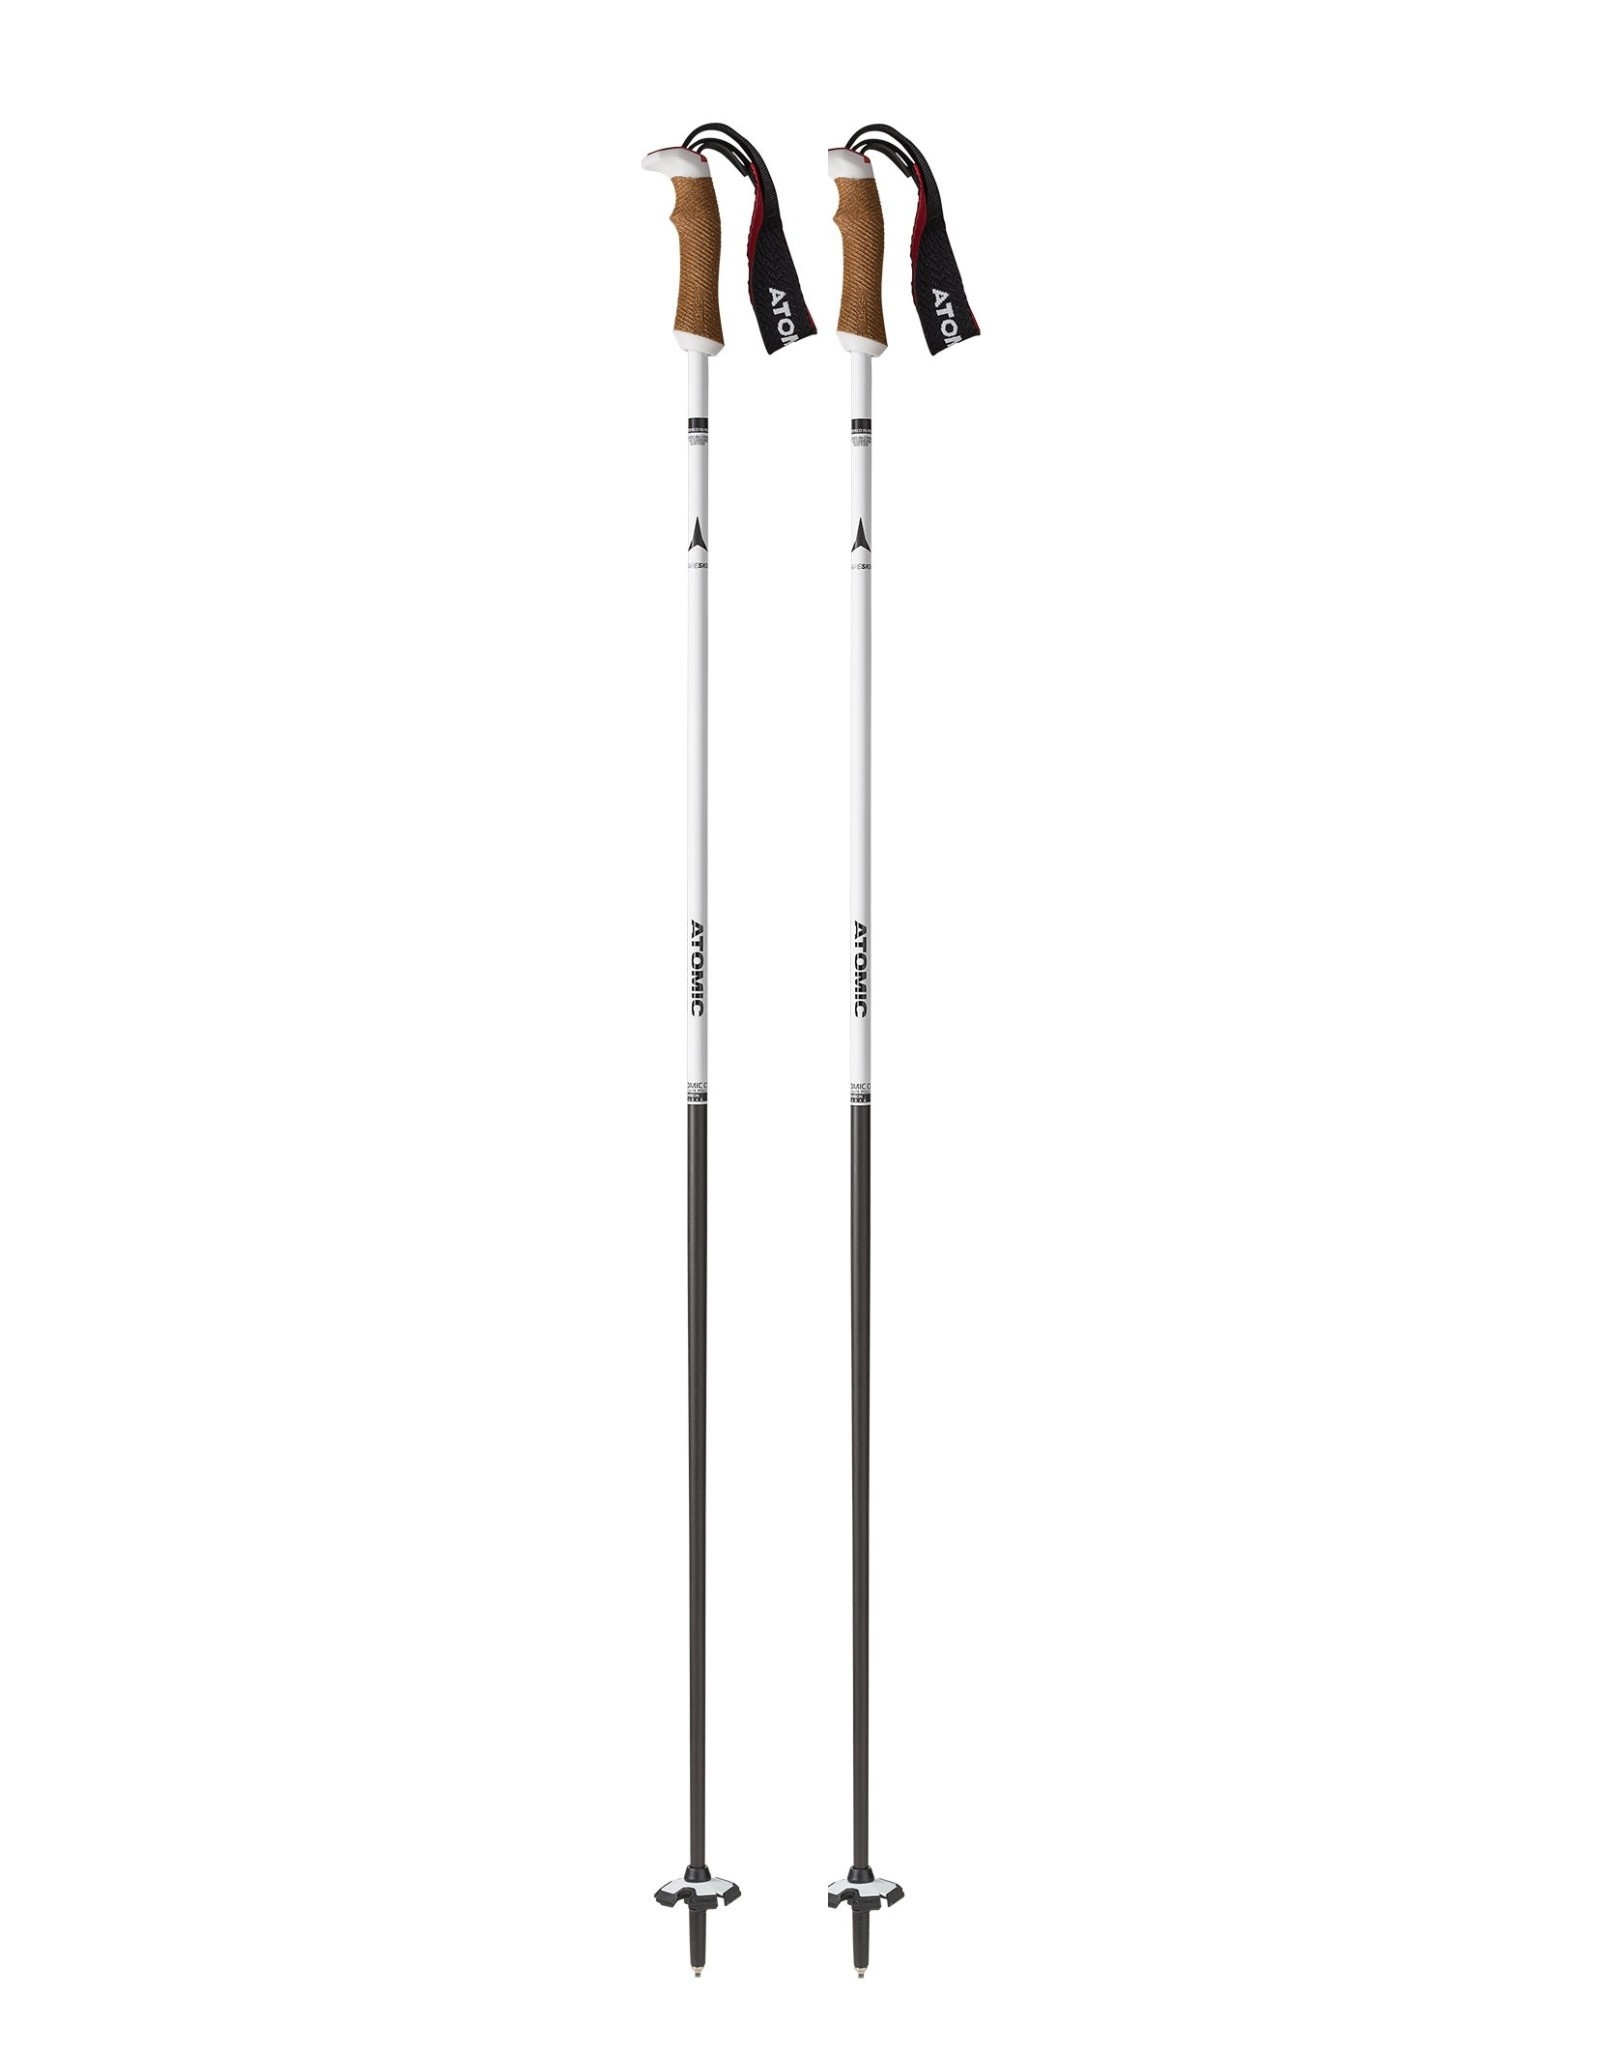 ATOMIC ATOMIC Ski Poles AMT ULTRA SQS W (20/21)